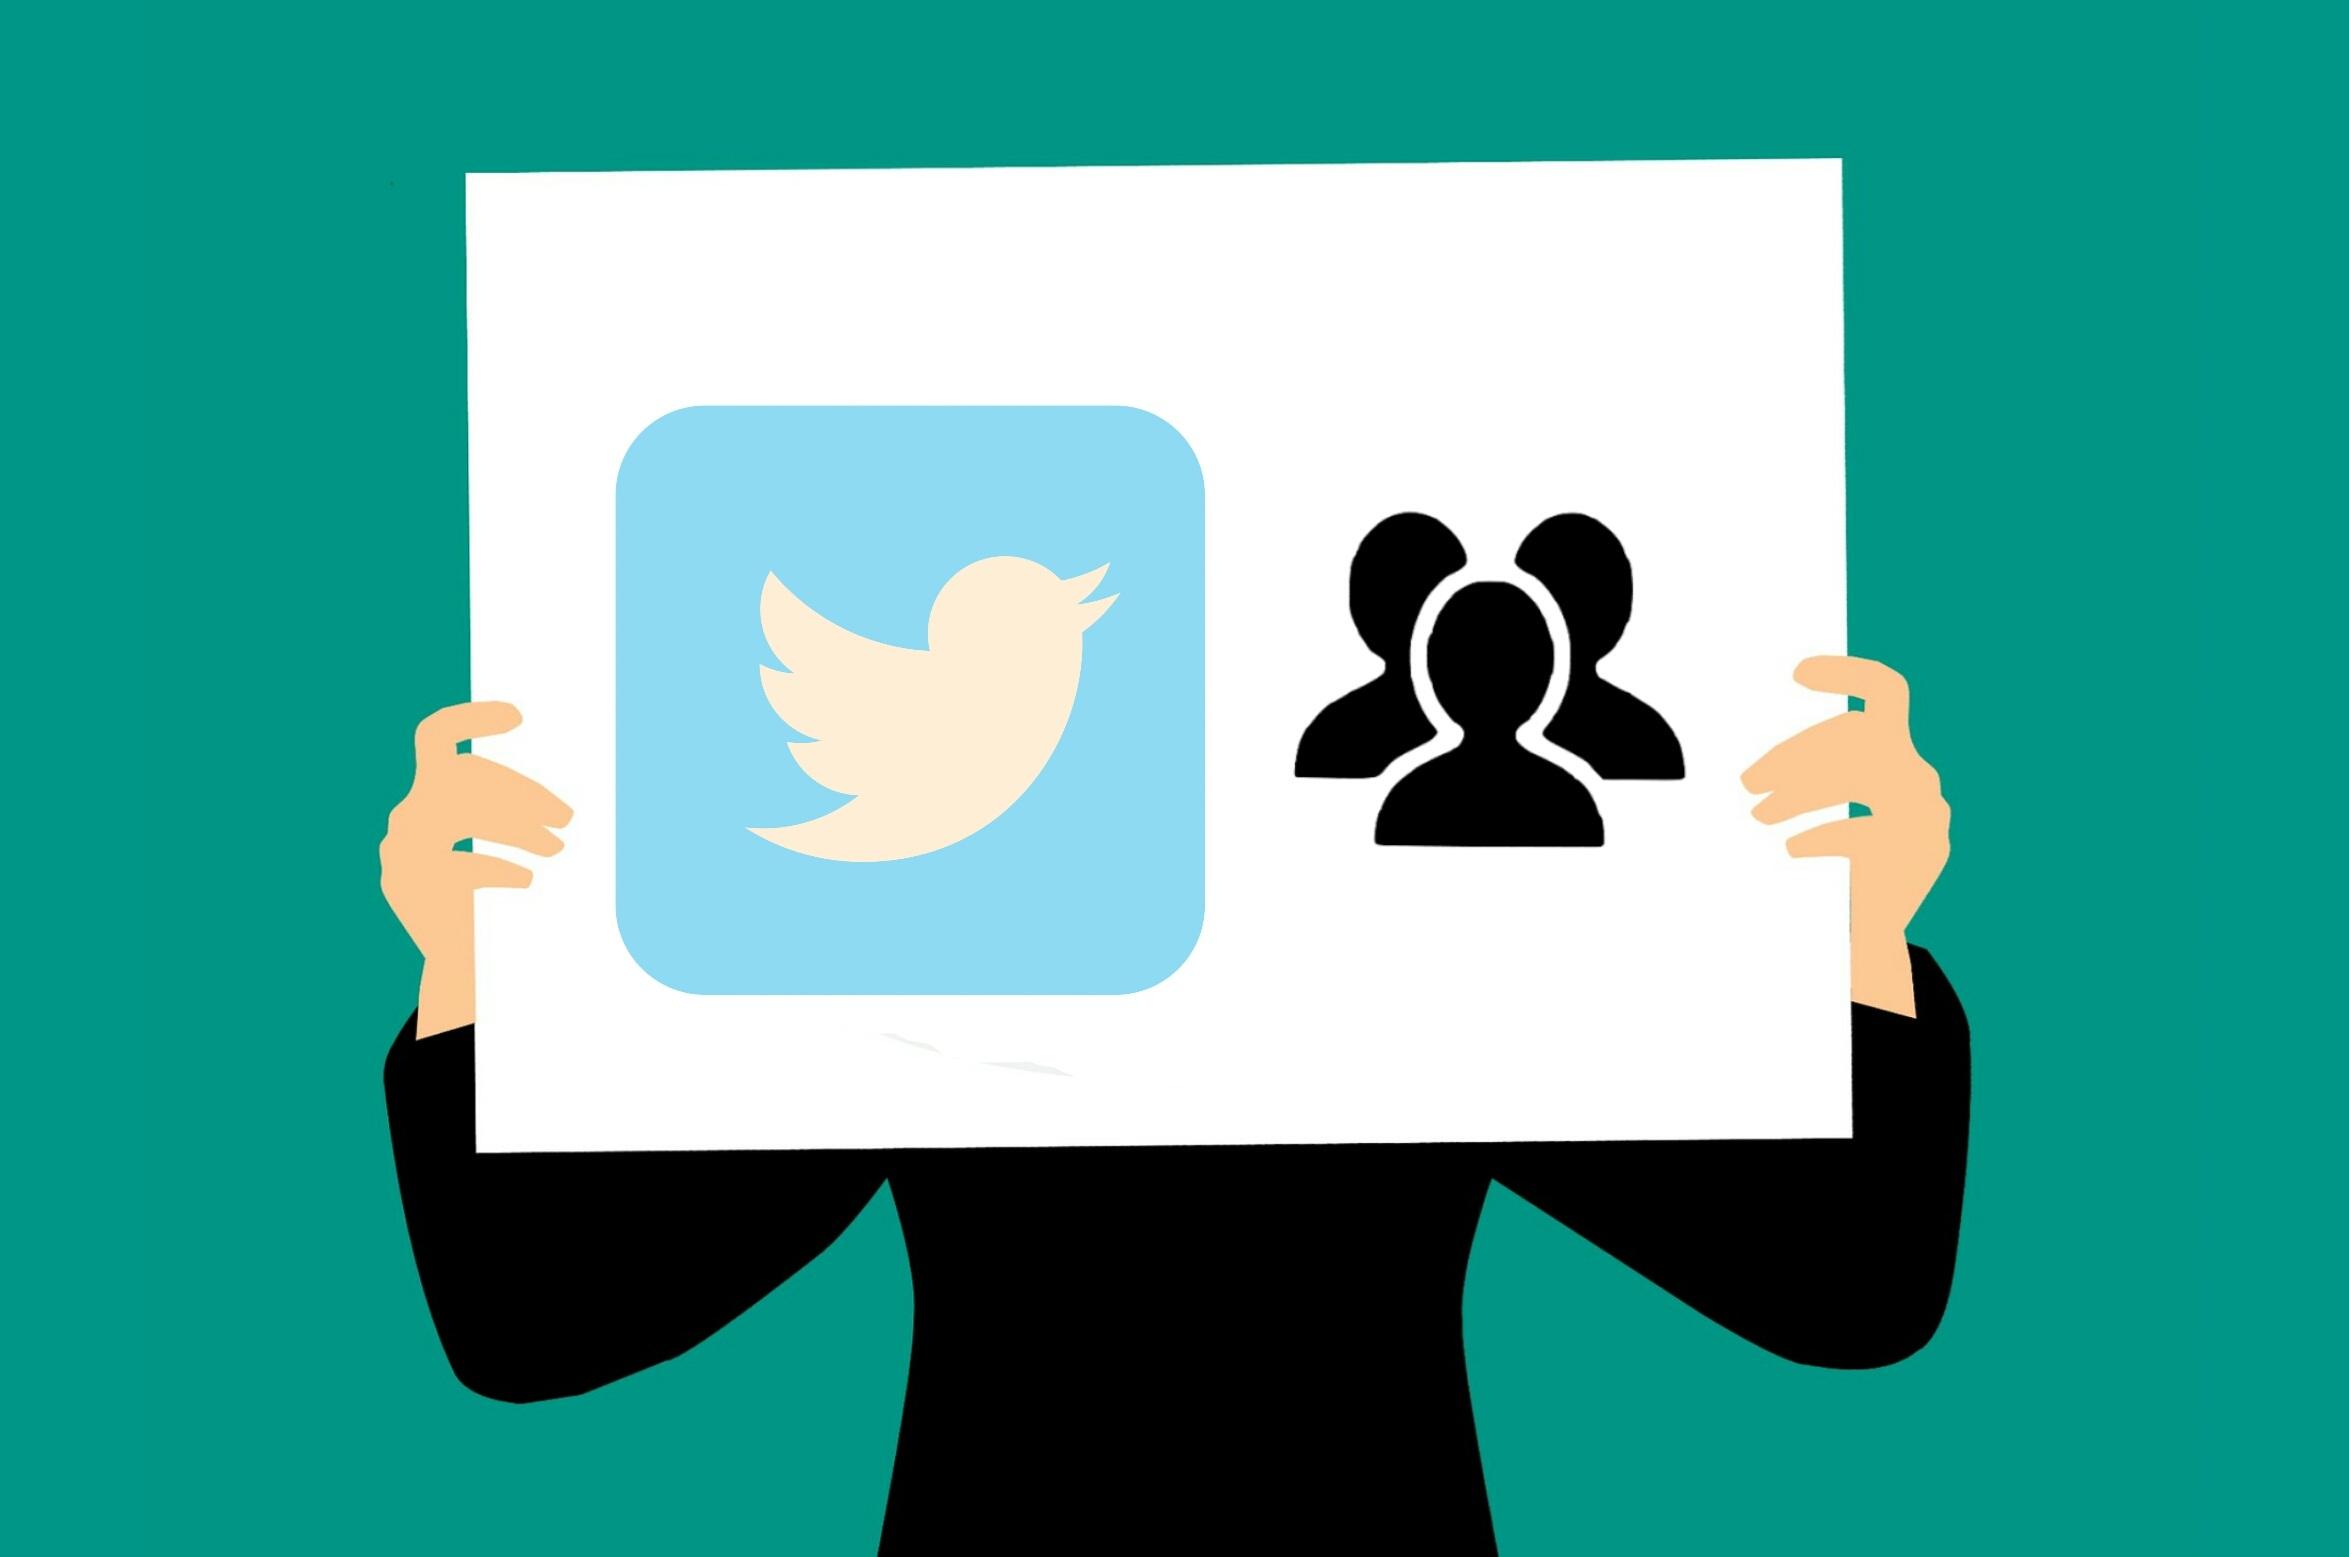 Free Images Twitter Retweet Like Sign Flat Symbol Set Social Media Cartoon Character Idea Freelancer Business Man Blank Poster Board